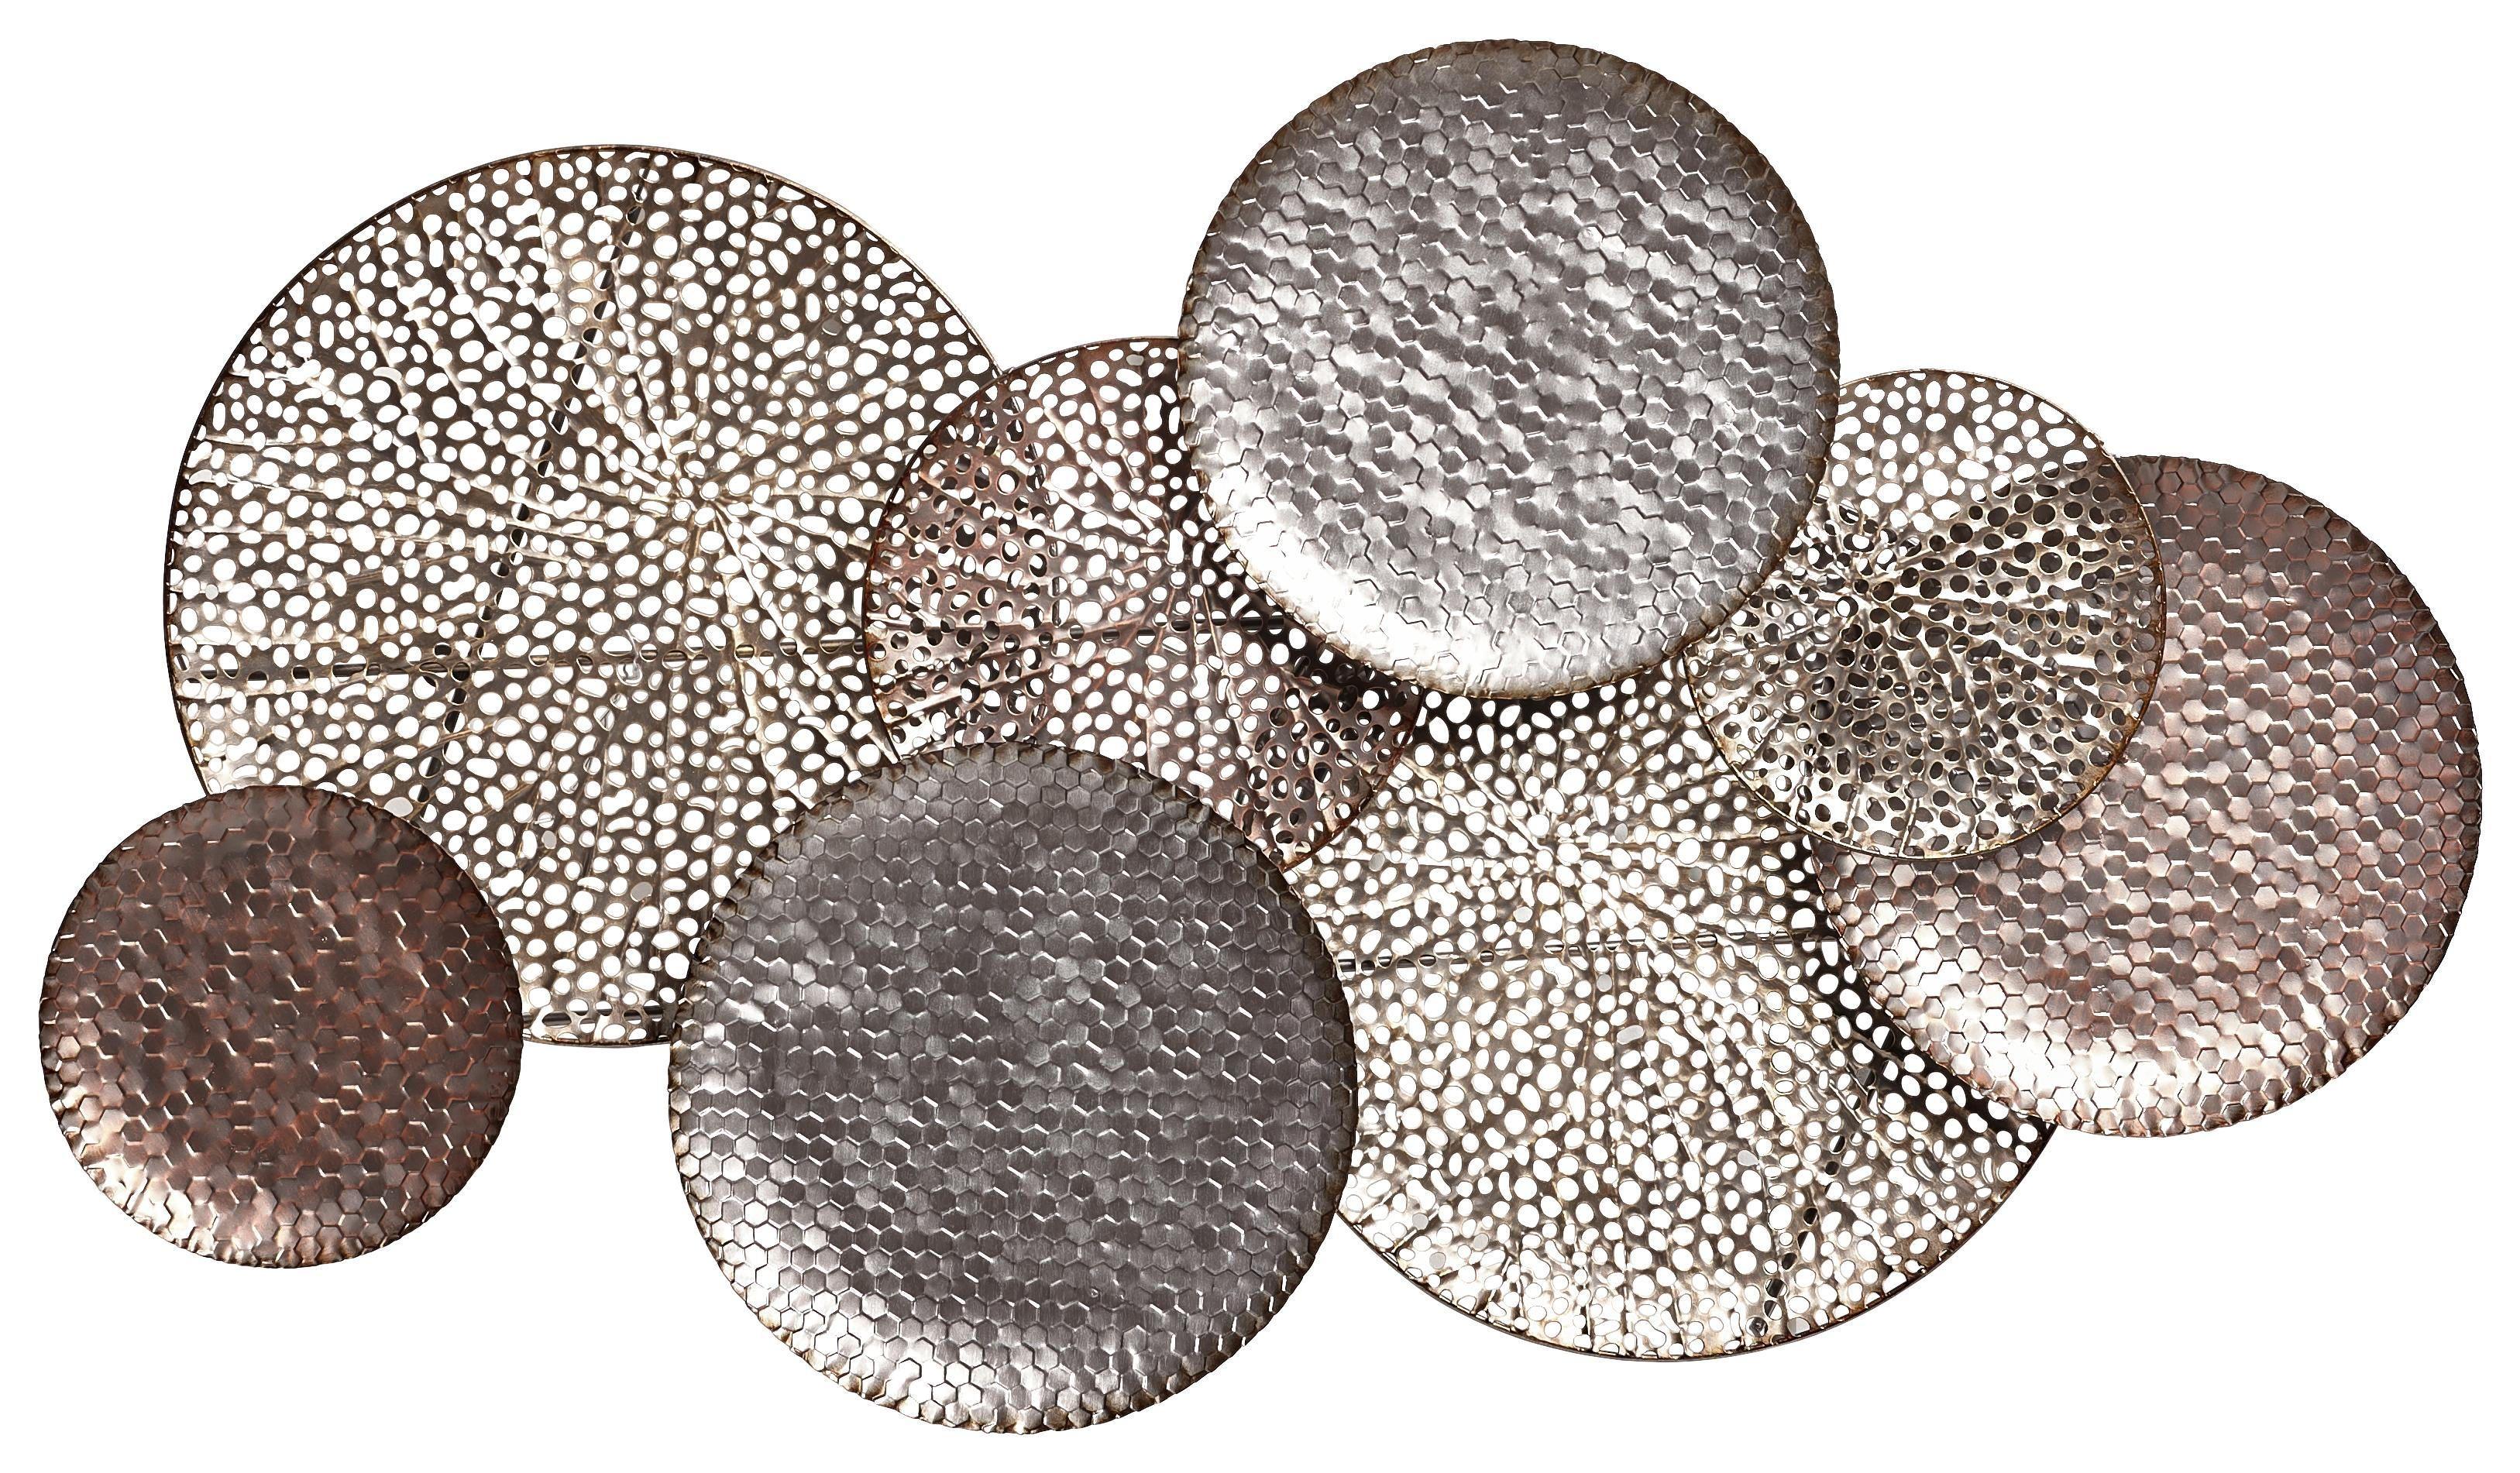 wanddeko metall wand dekorieren mondphasen deko